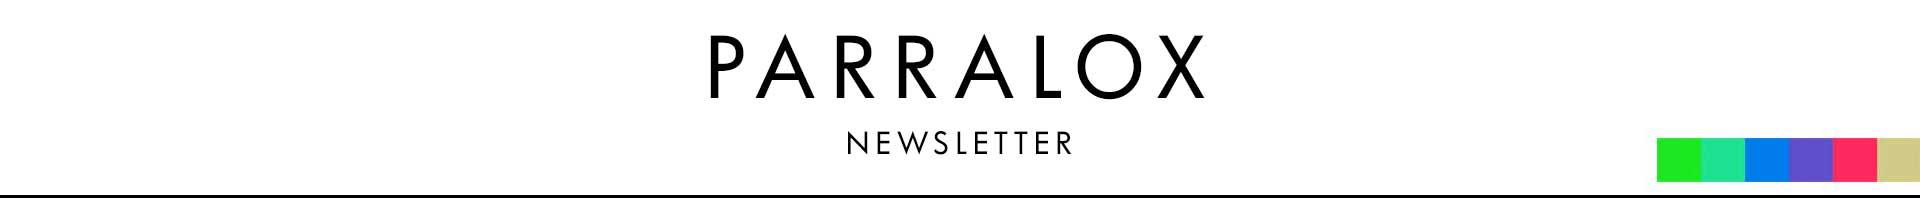 Parralox - Newsletter